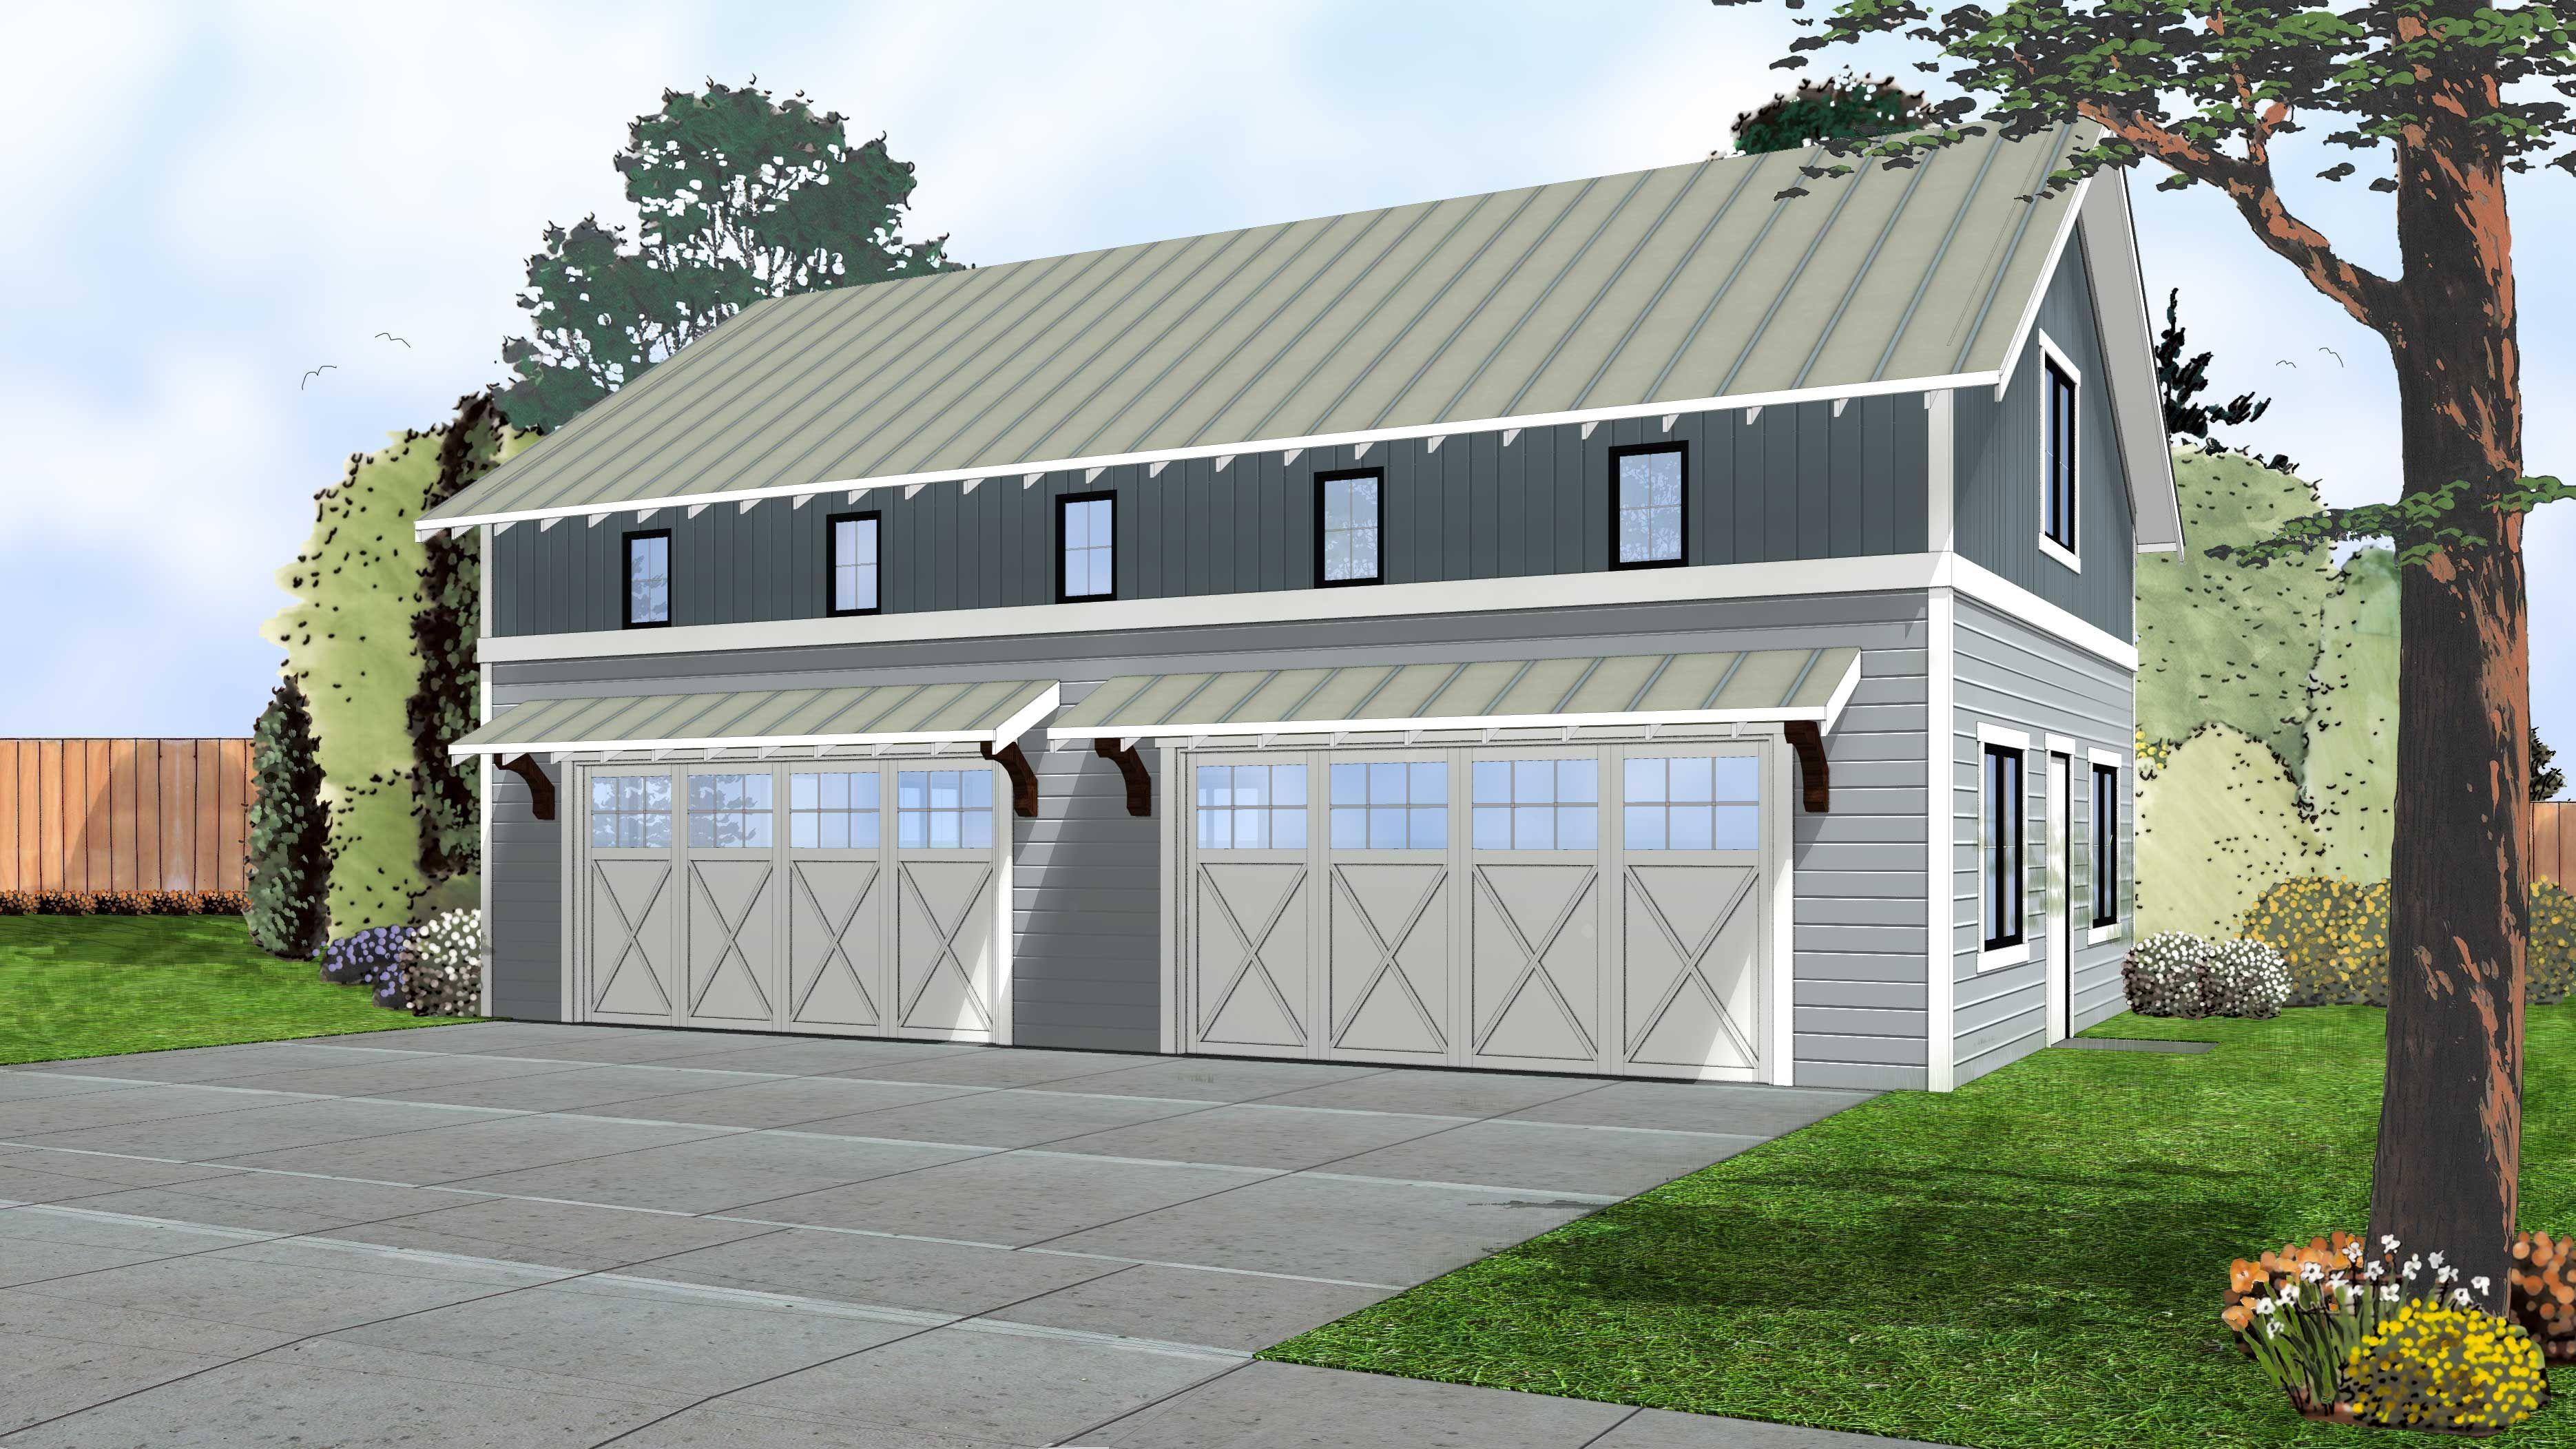 4 Car Garage with Indoor Basketball Court